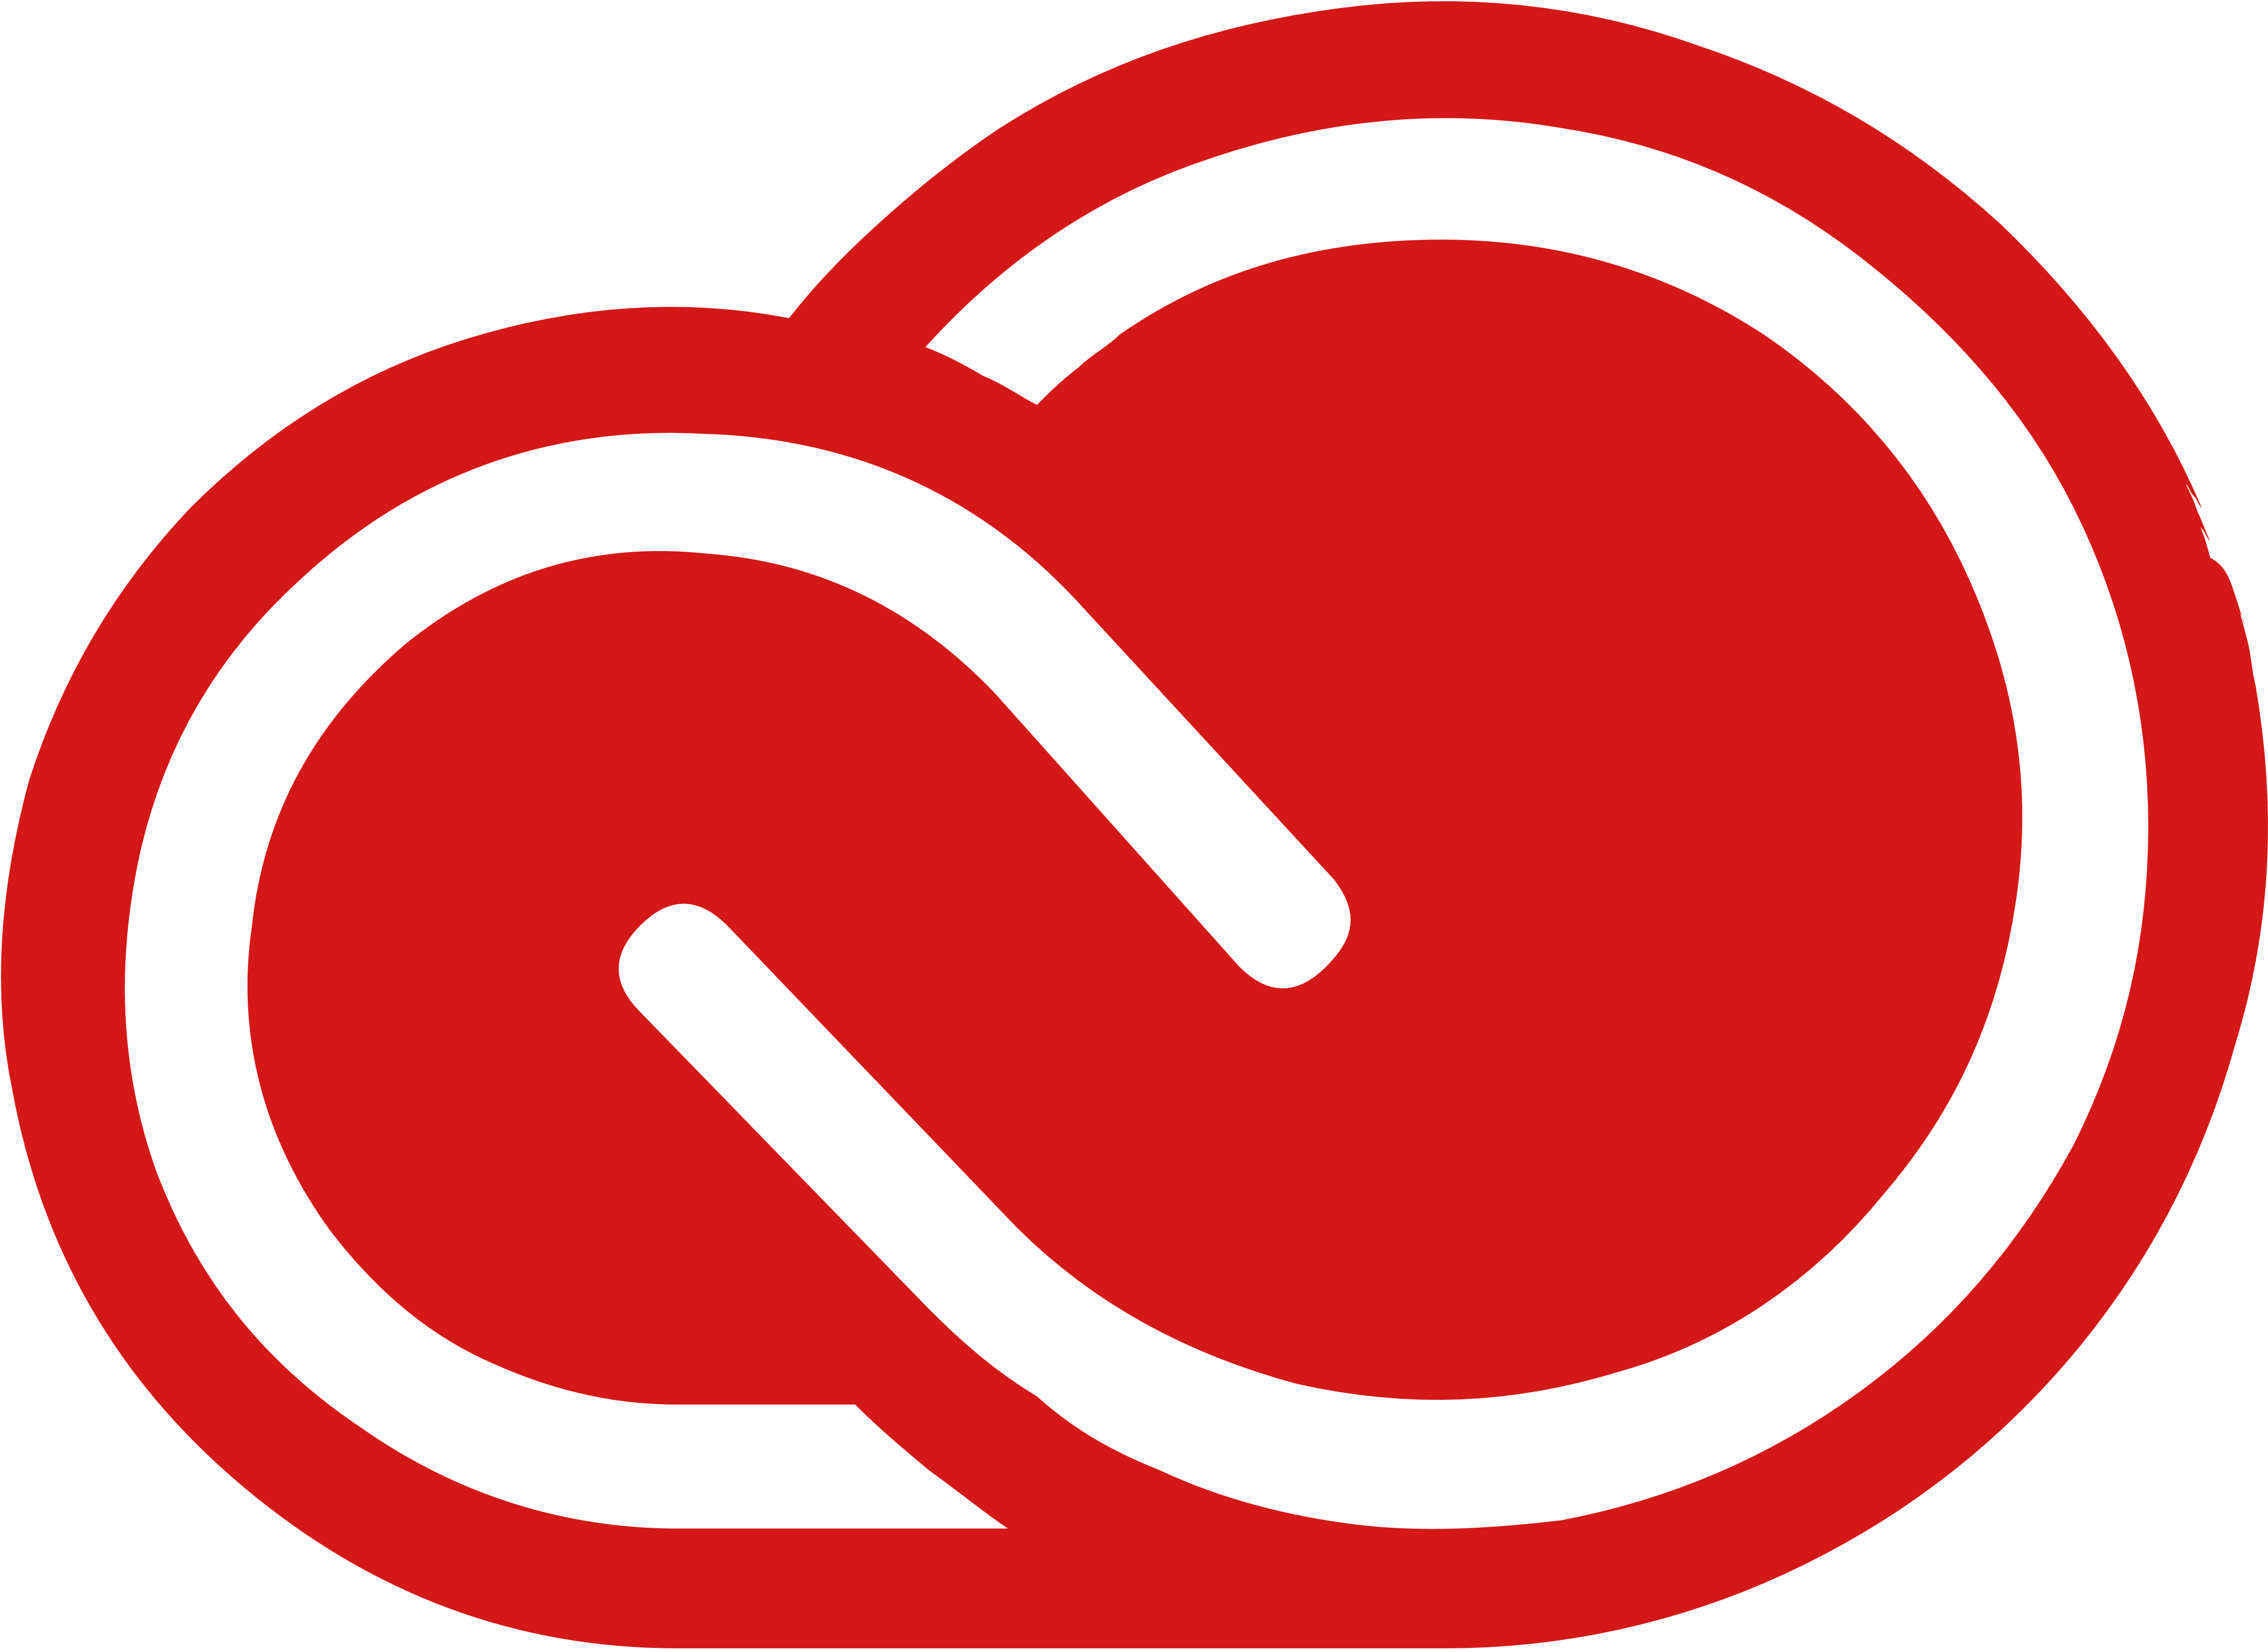 Adobe Creative Cloud logo, logotype. All logos, emblems, brands.